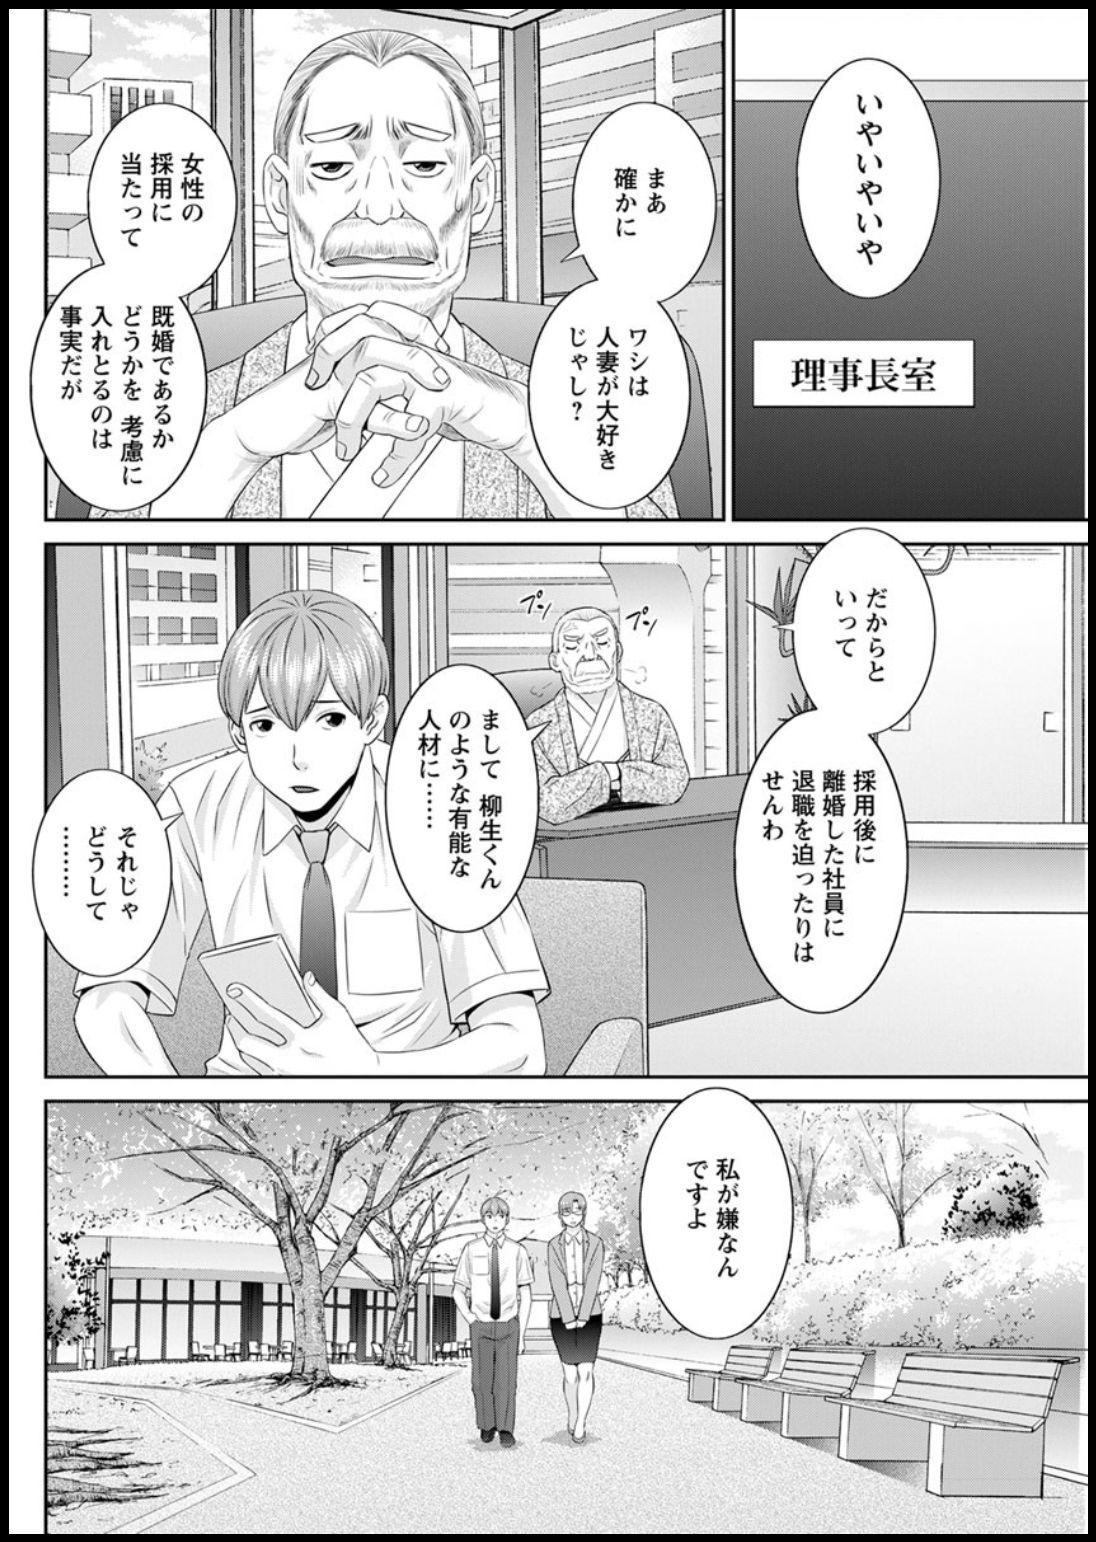 [Kawamori Misaki] Kaikan Hitotsuma Gakuen Ch. 1-6, 8-20 [Digital] 149